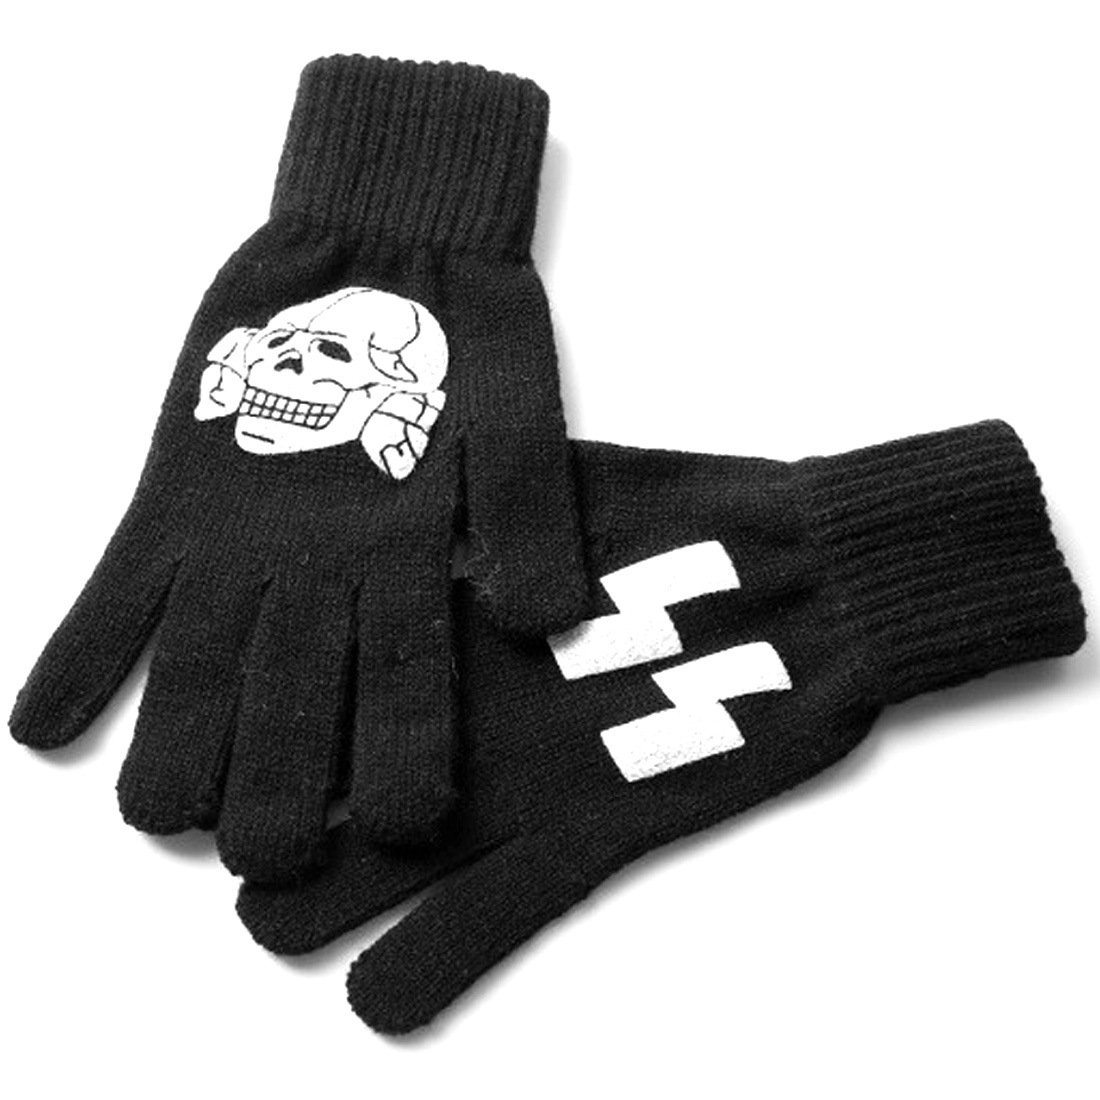 Men Five Fingers Geometric Prints Dark Gray Knit Gloves Pair